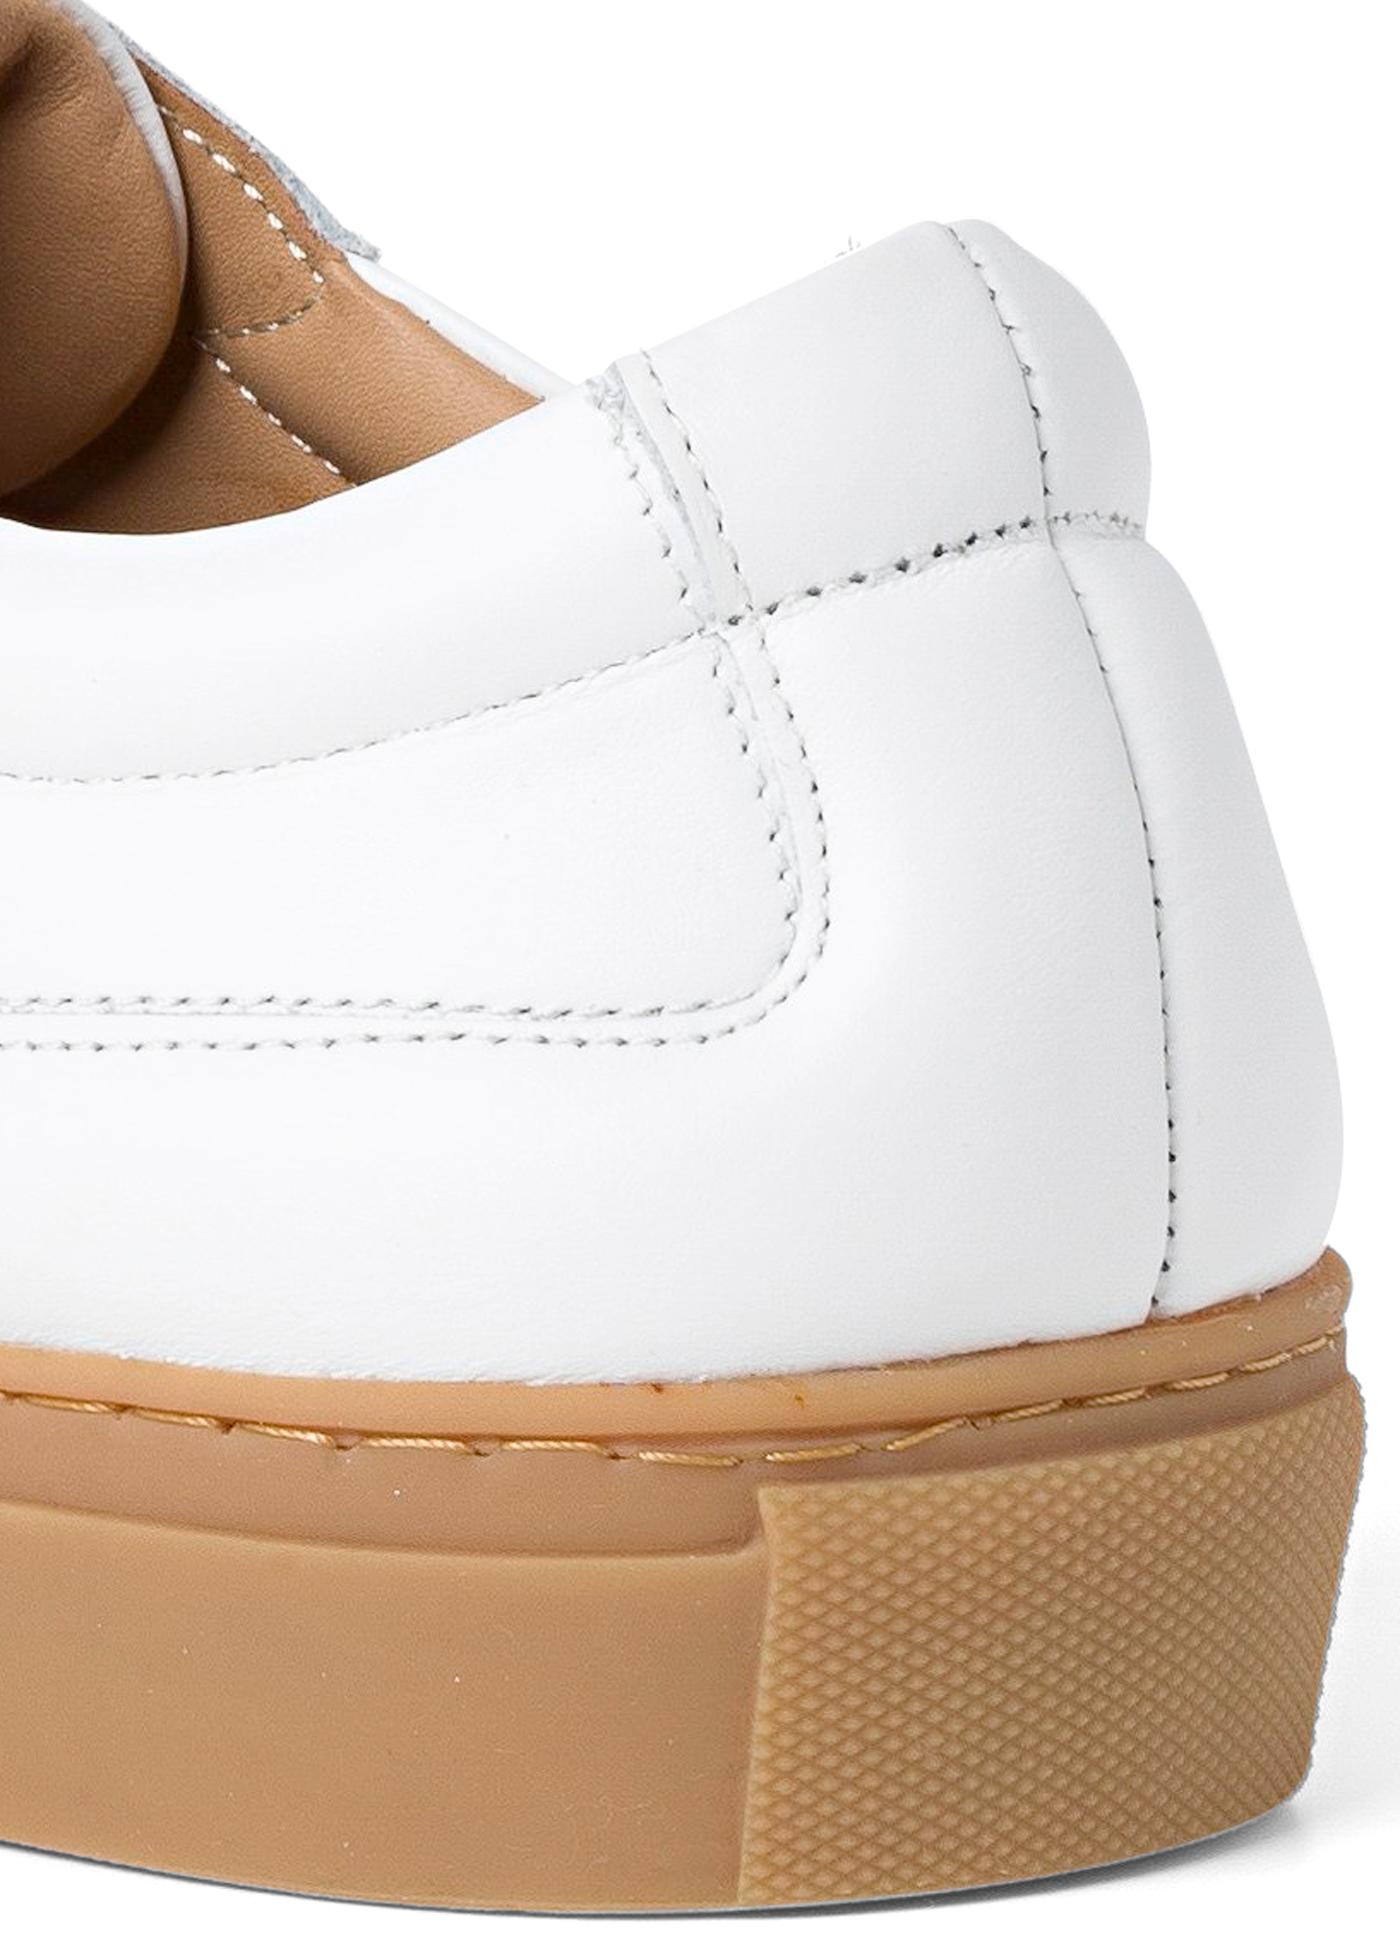 Spartacus Tennis Shoe 215 image number 3